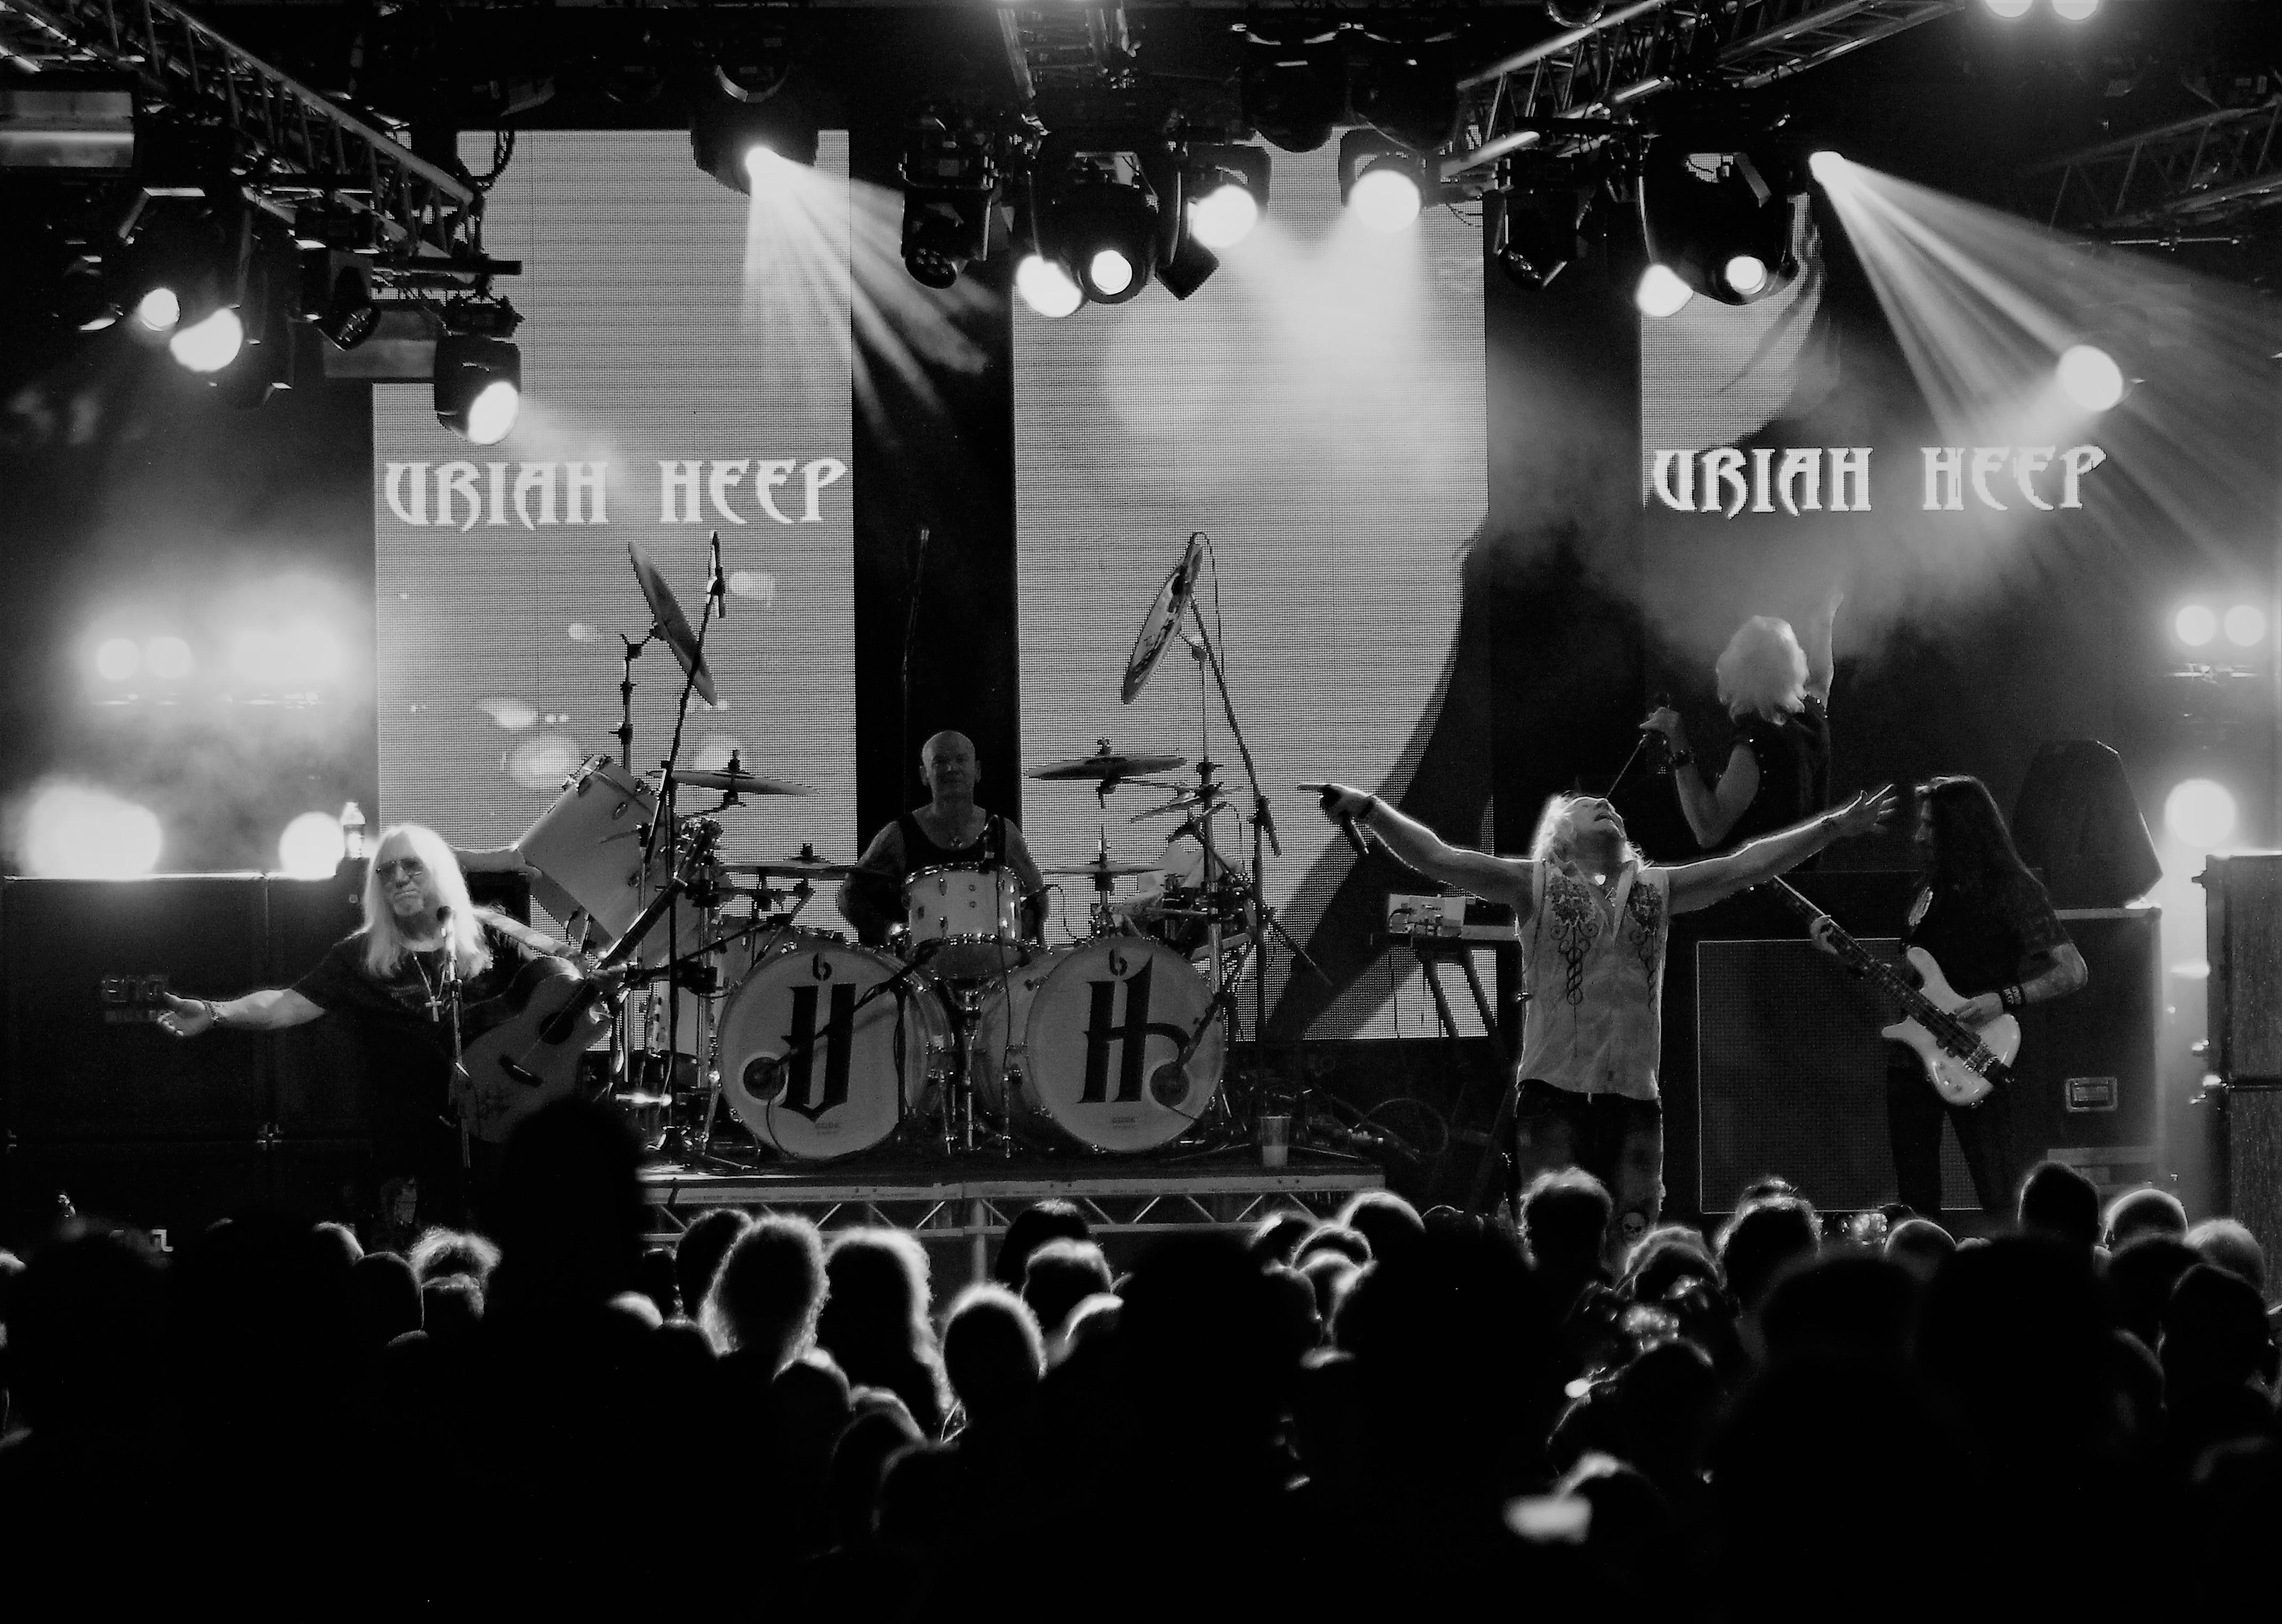 Day 2 - Main Stage_6 - Uriah Heep (27)